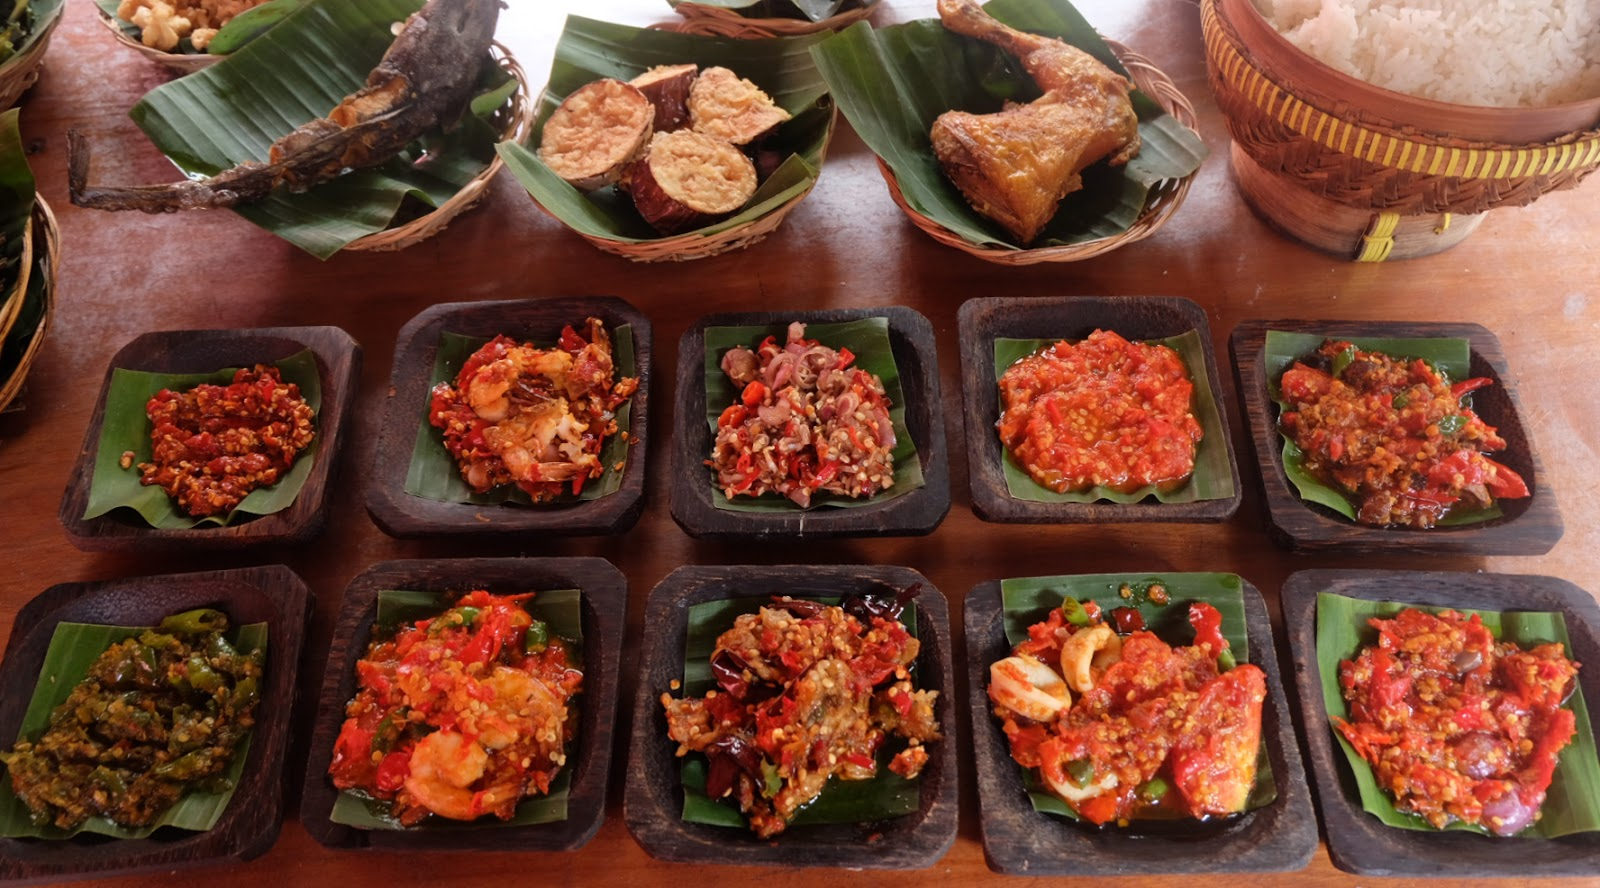 orang indonesia unik suka makan sambal